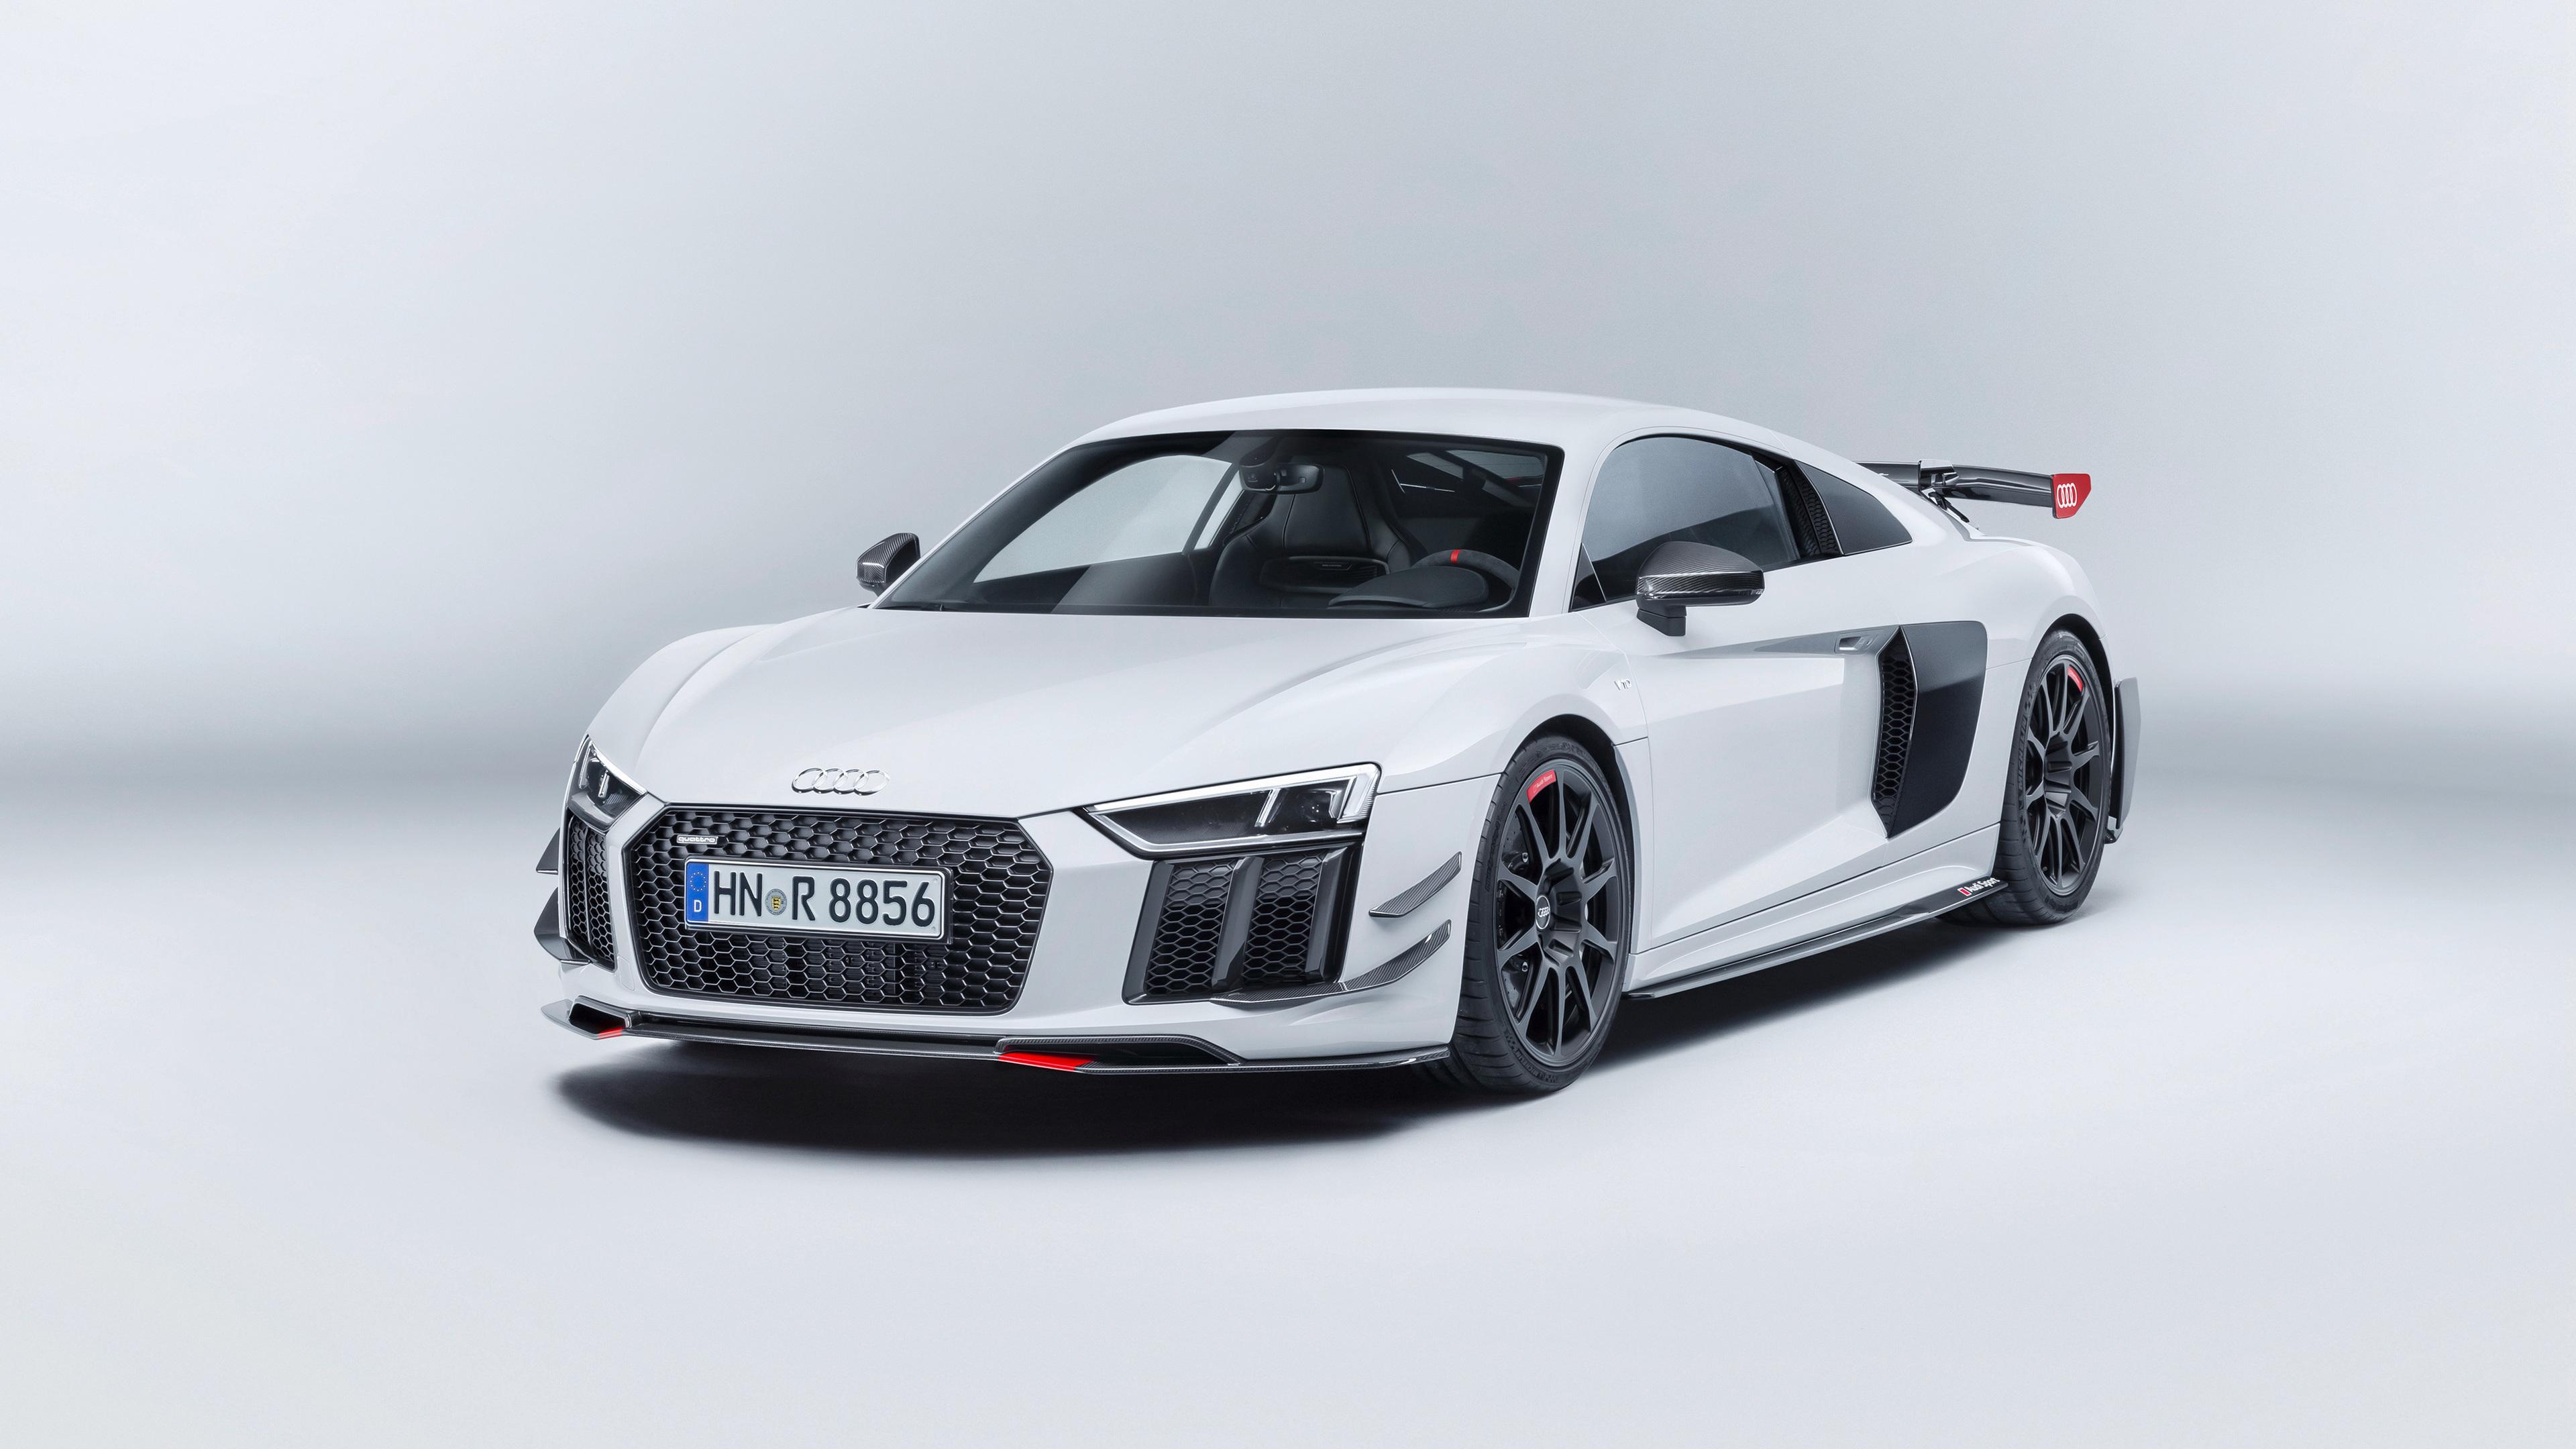 audi r8 performance parts 2017 1539105896 - Audi R8 Performance Parts 2017 - hd-wallpapers, cars wallpapers, audi wallpapers, audi r8 wallpapers, 4k-wallpapers, 2017 cars wallpapers